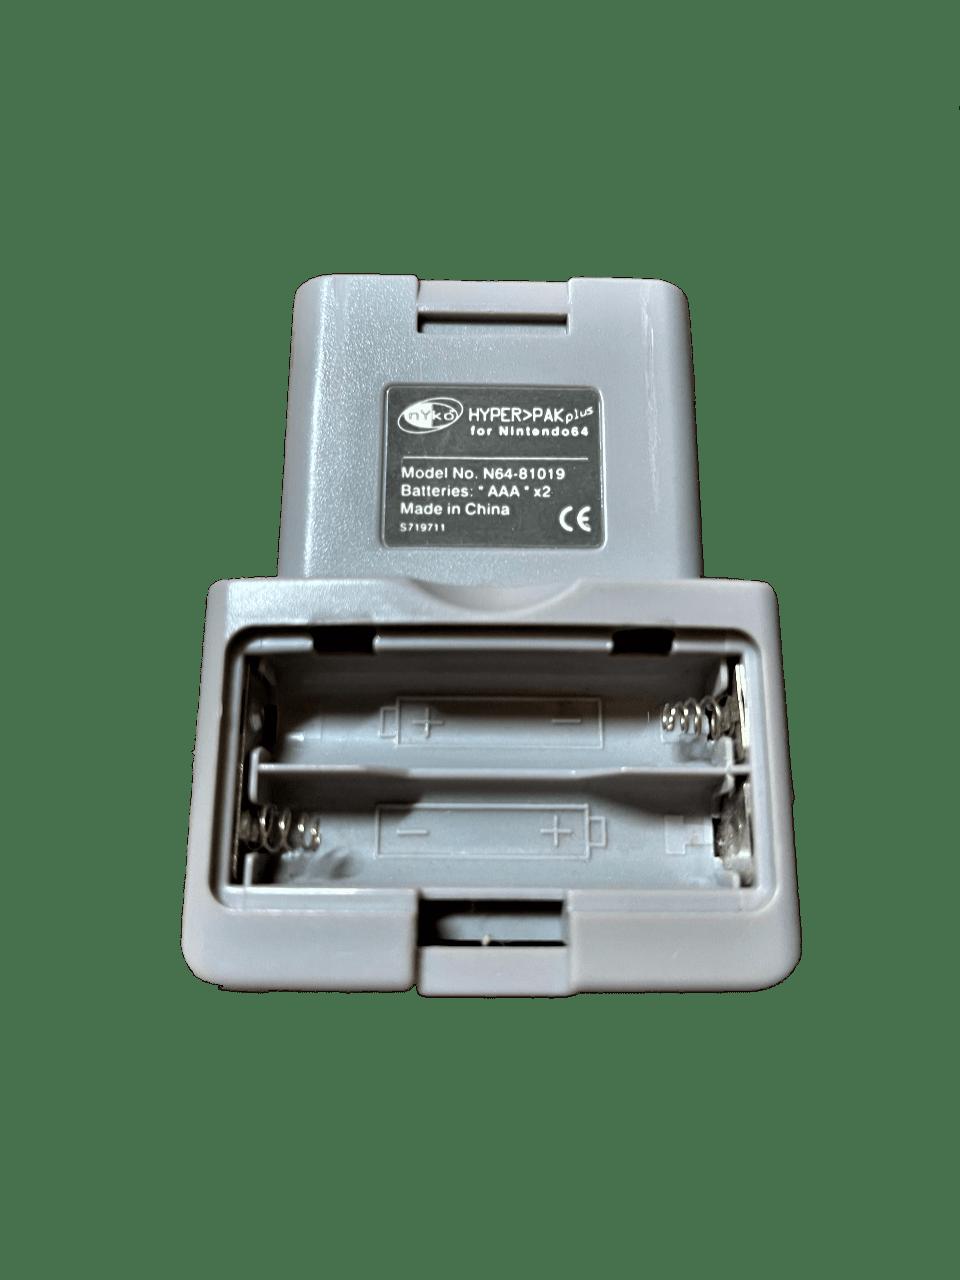 Nyko Hyper Pak Plus for Nintendo 64